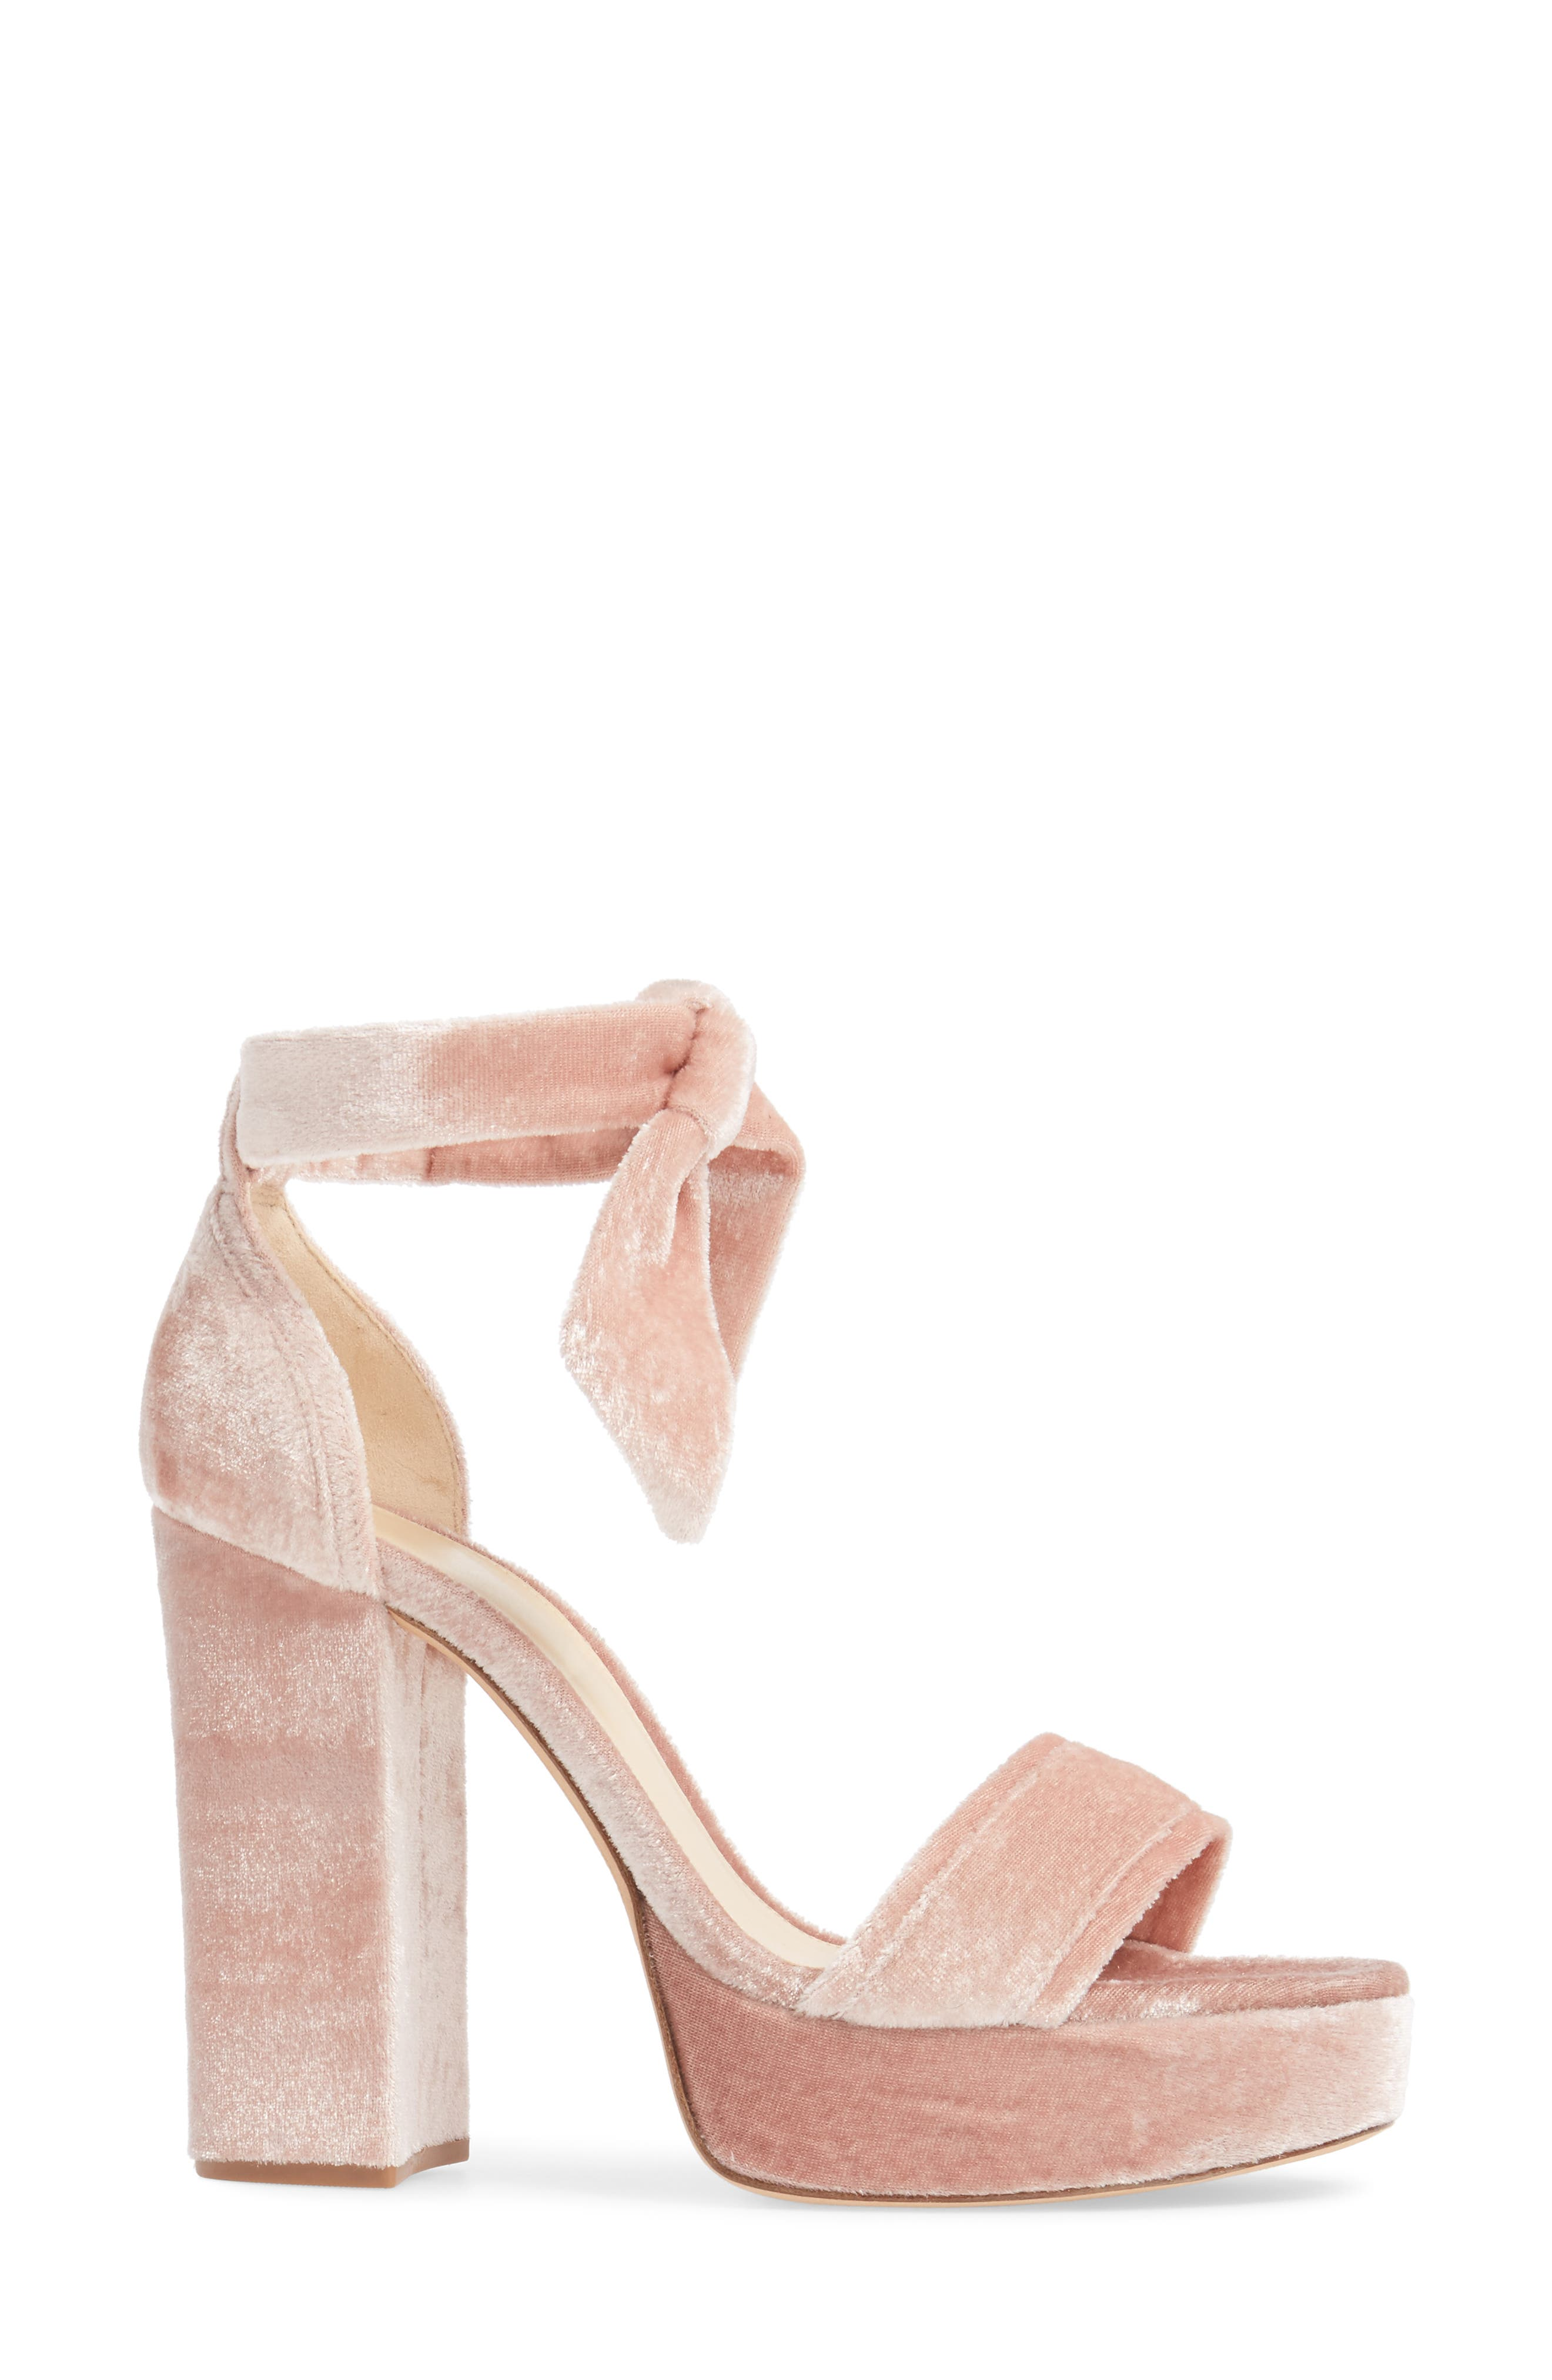 Alternate Image 3  - Alexandre Birman Celine Platform Sandal (Women)